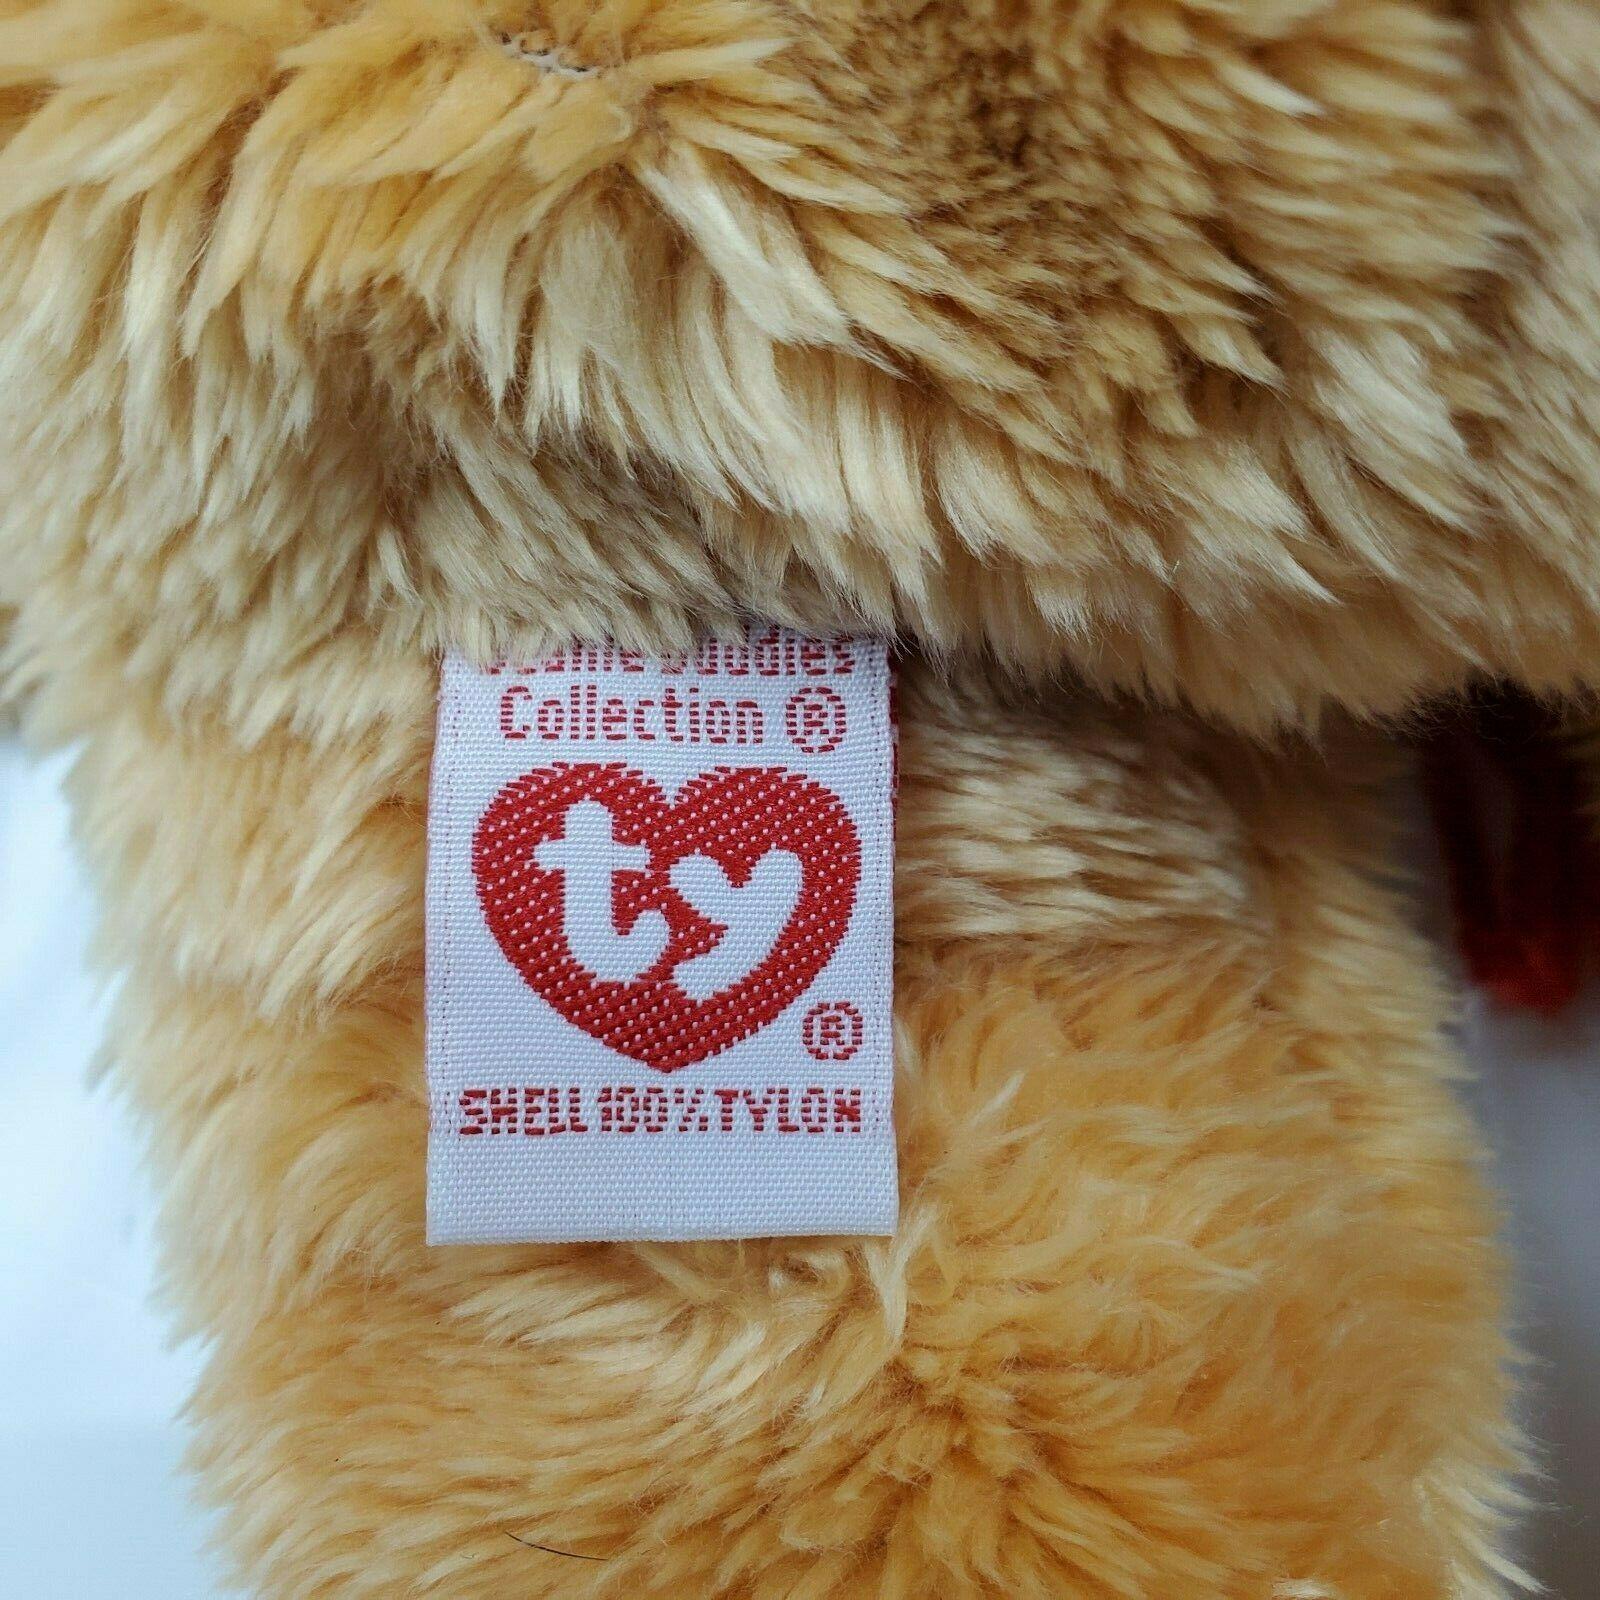 "Christmas Ty Beanie Buddies 2003 Holiday Teddy Bear 14"" Plush Retired New w/ Tag"